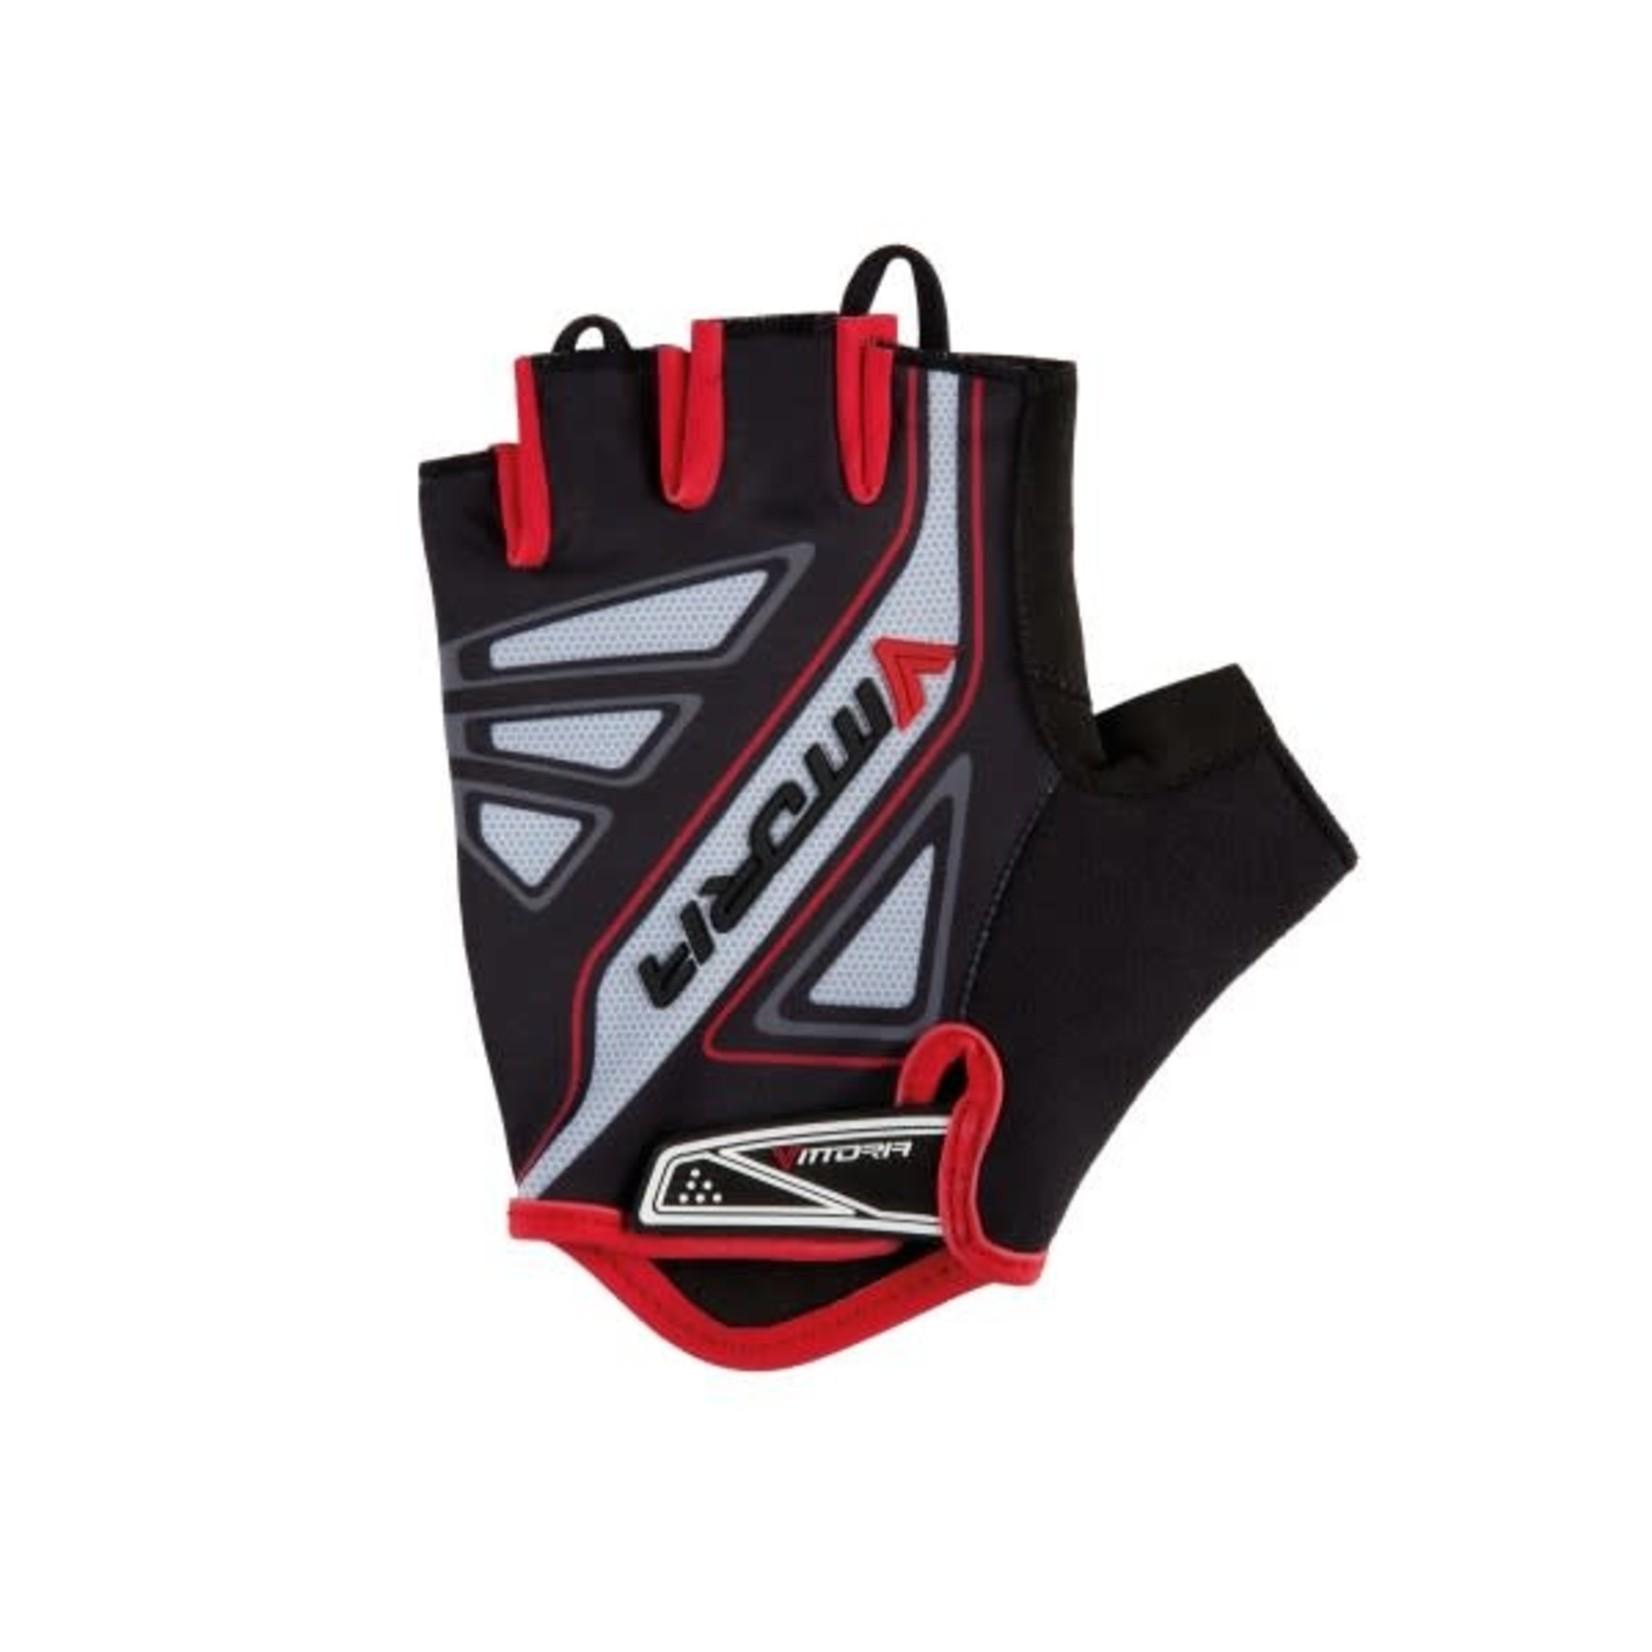 Vittoria Victory Gloves